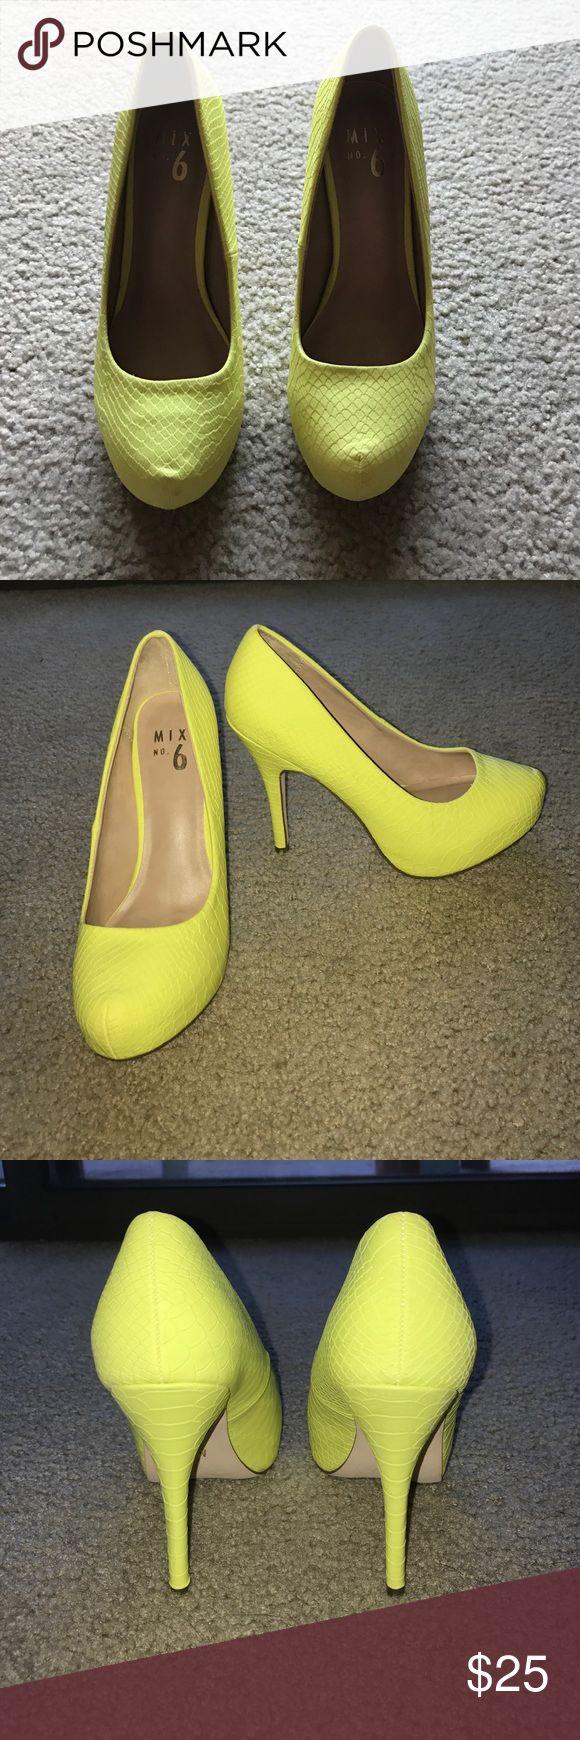 Mix #6 heels. BEAUTIFUL NEON YELLOW! Make a statement! Brand new neon yellow heels. mix no. 6 Shoes Heels